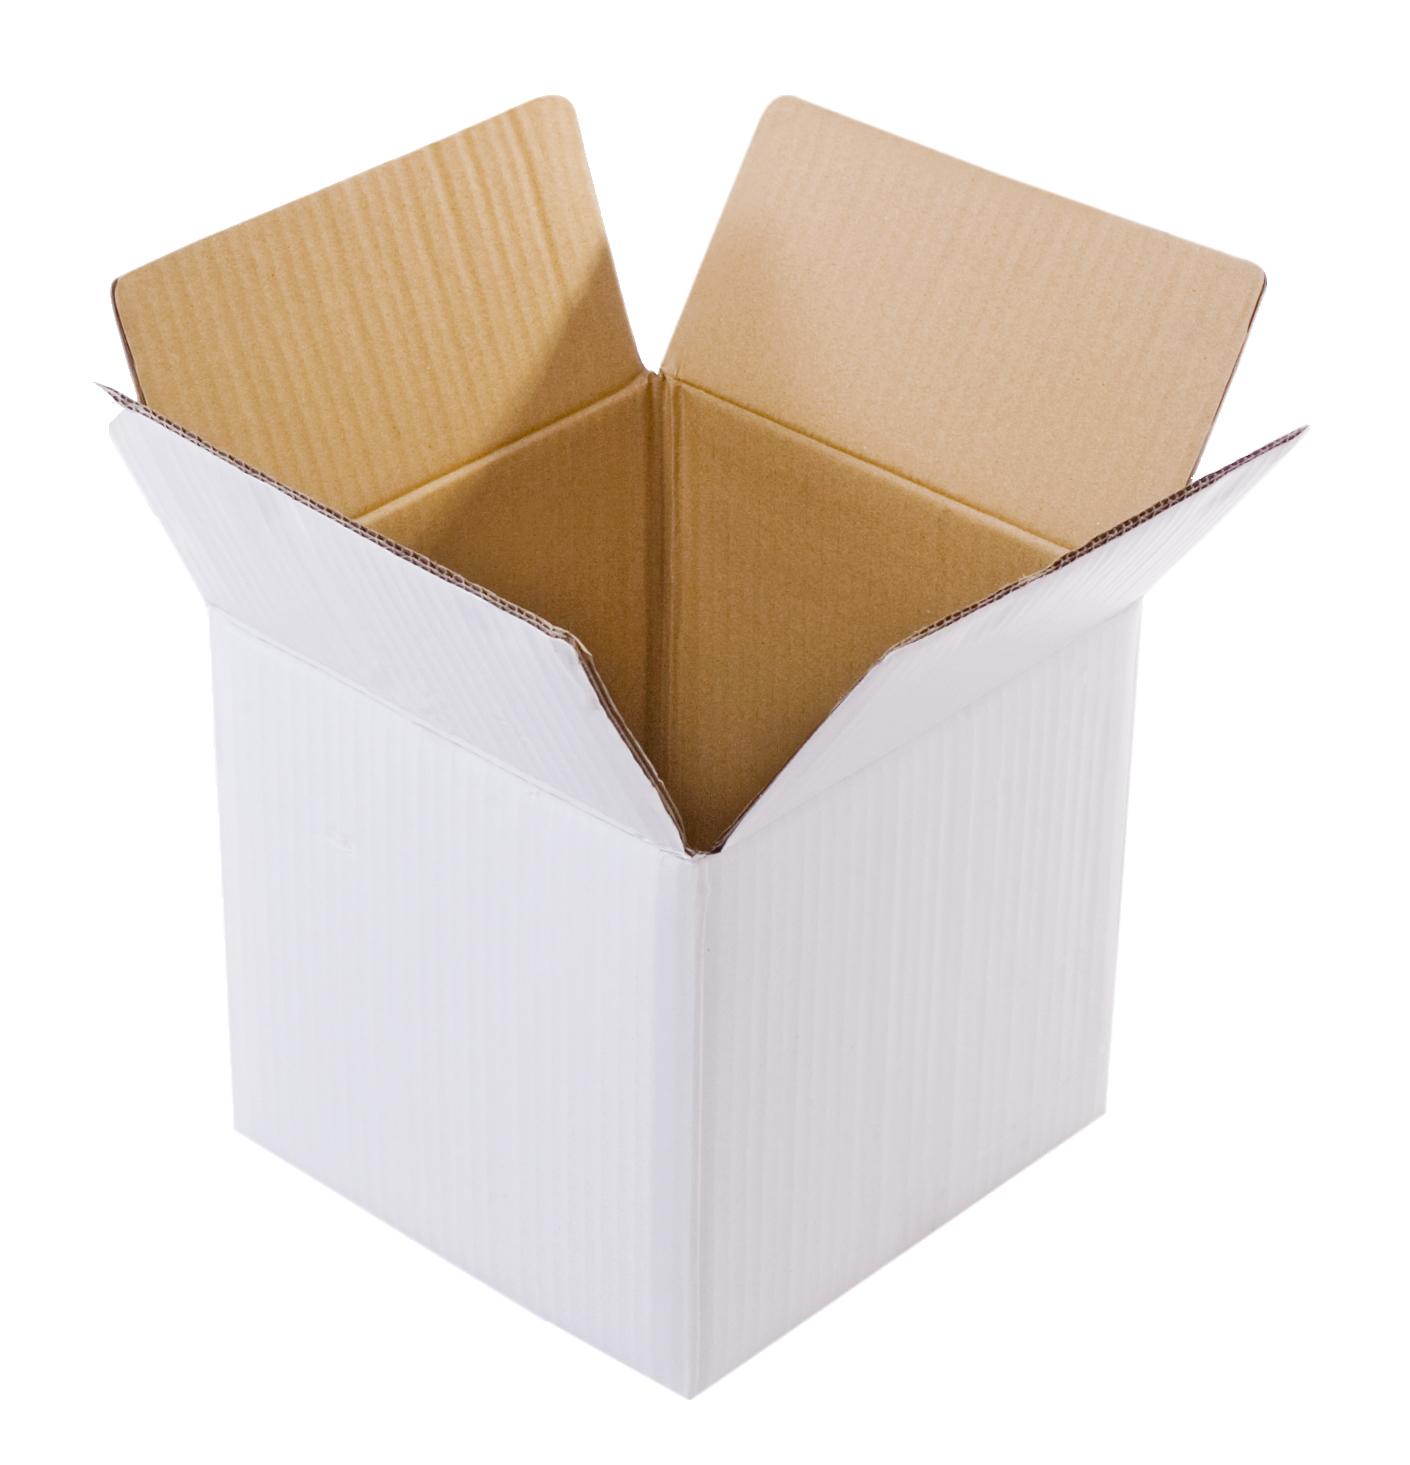 White Cube Box, 3Ply